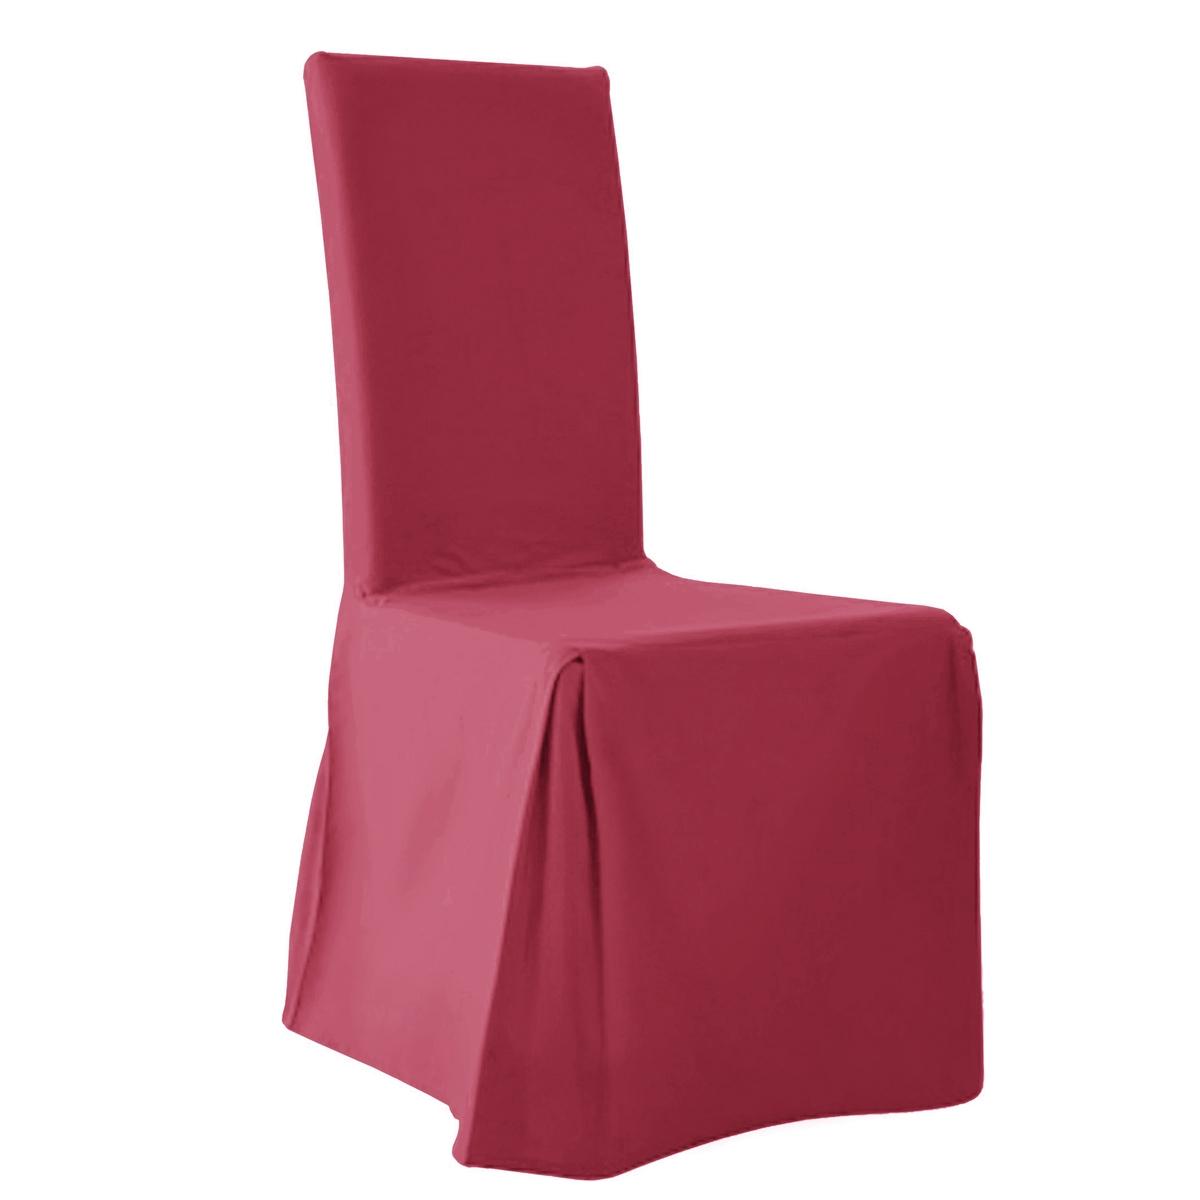 Capas para cadeira (lotes de 2)